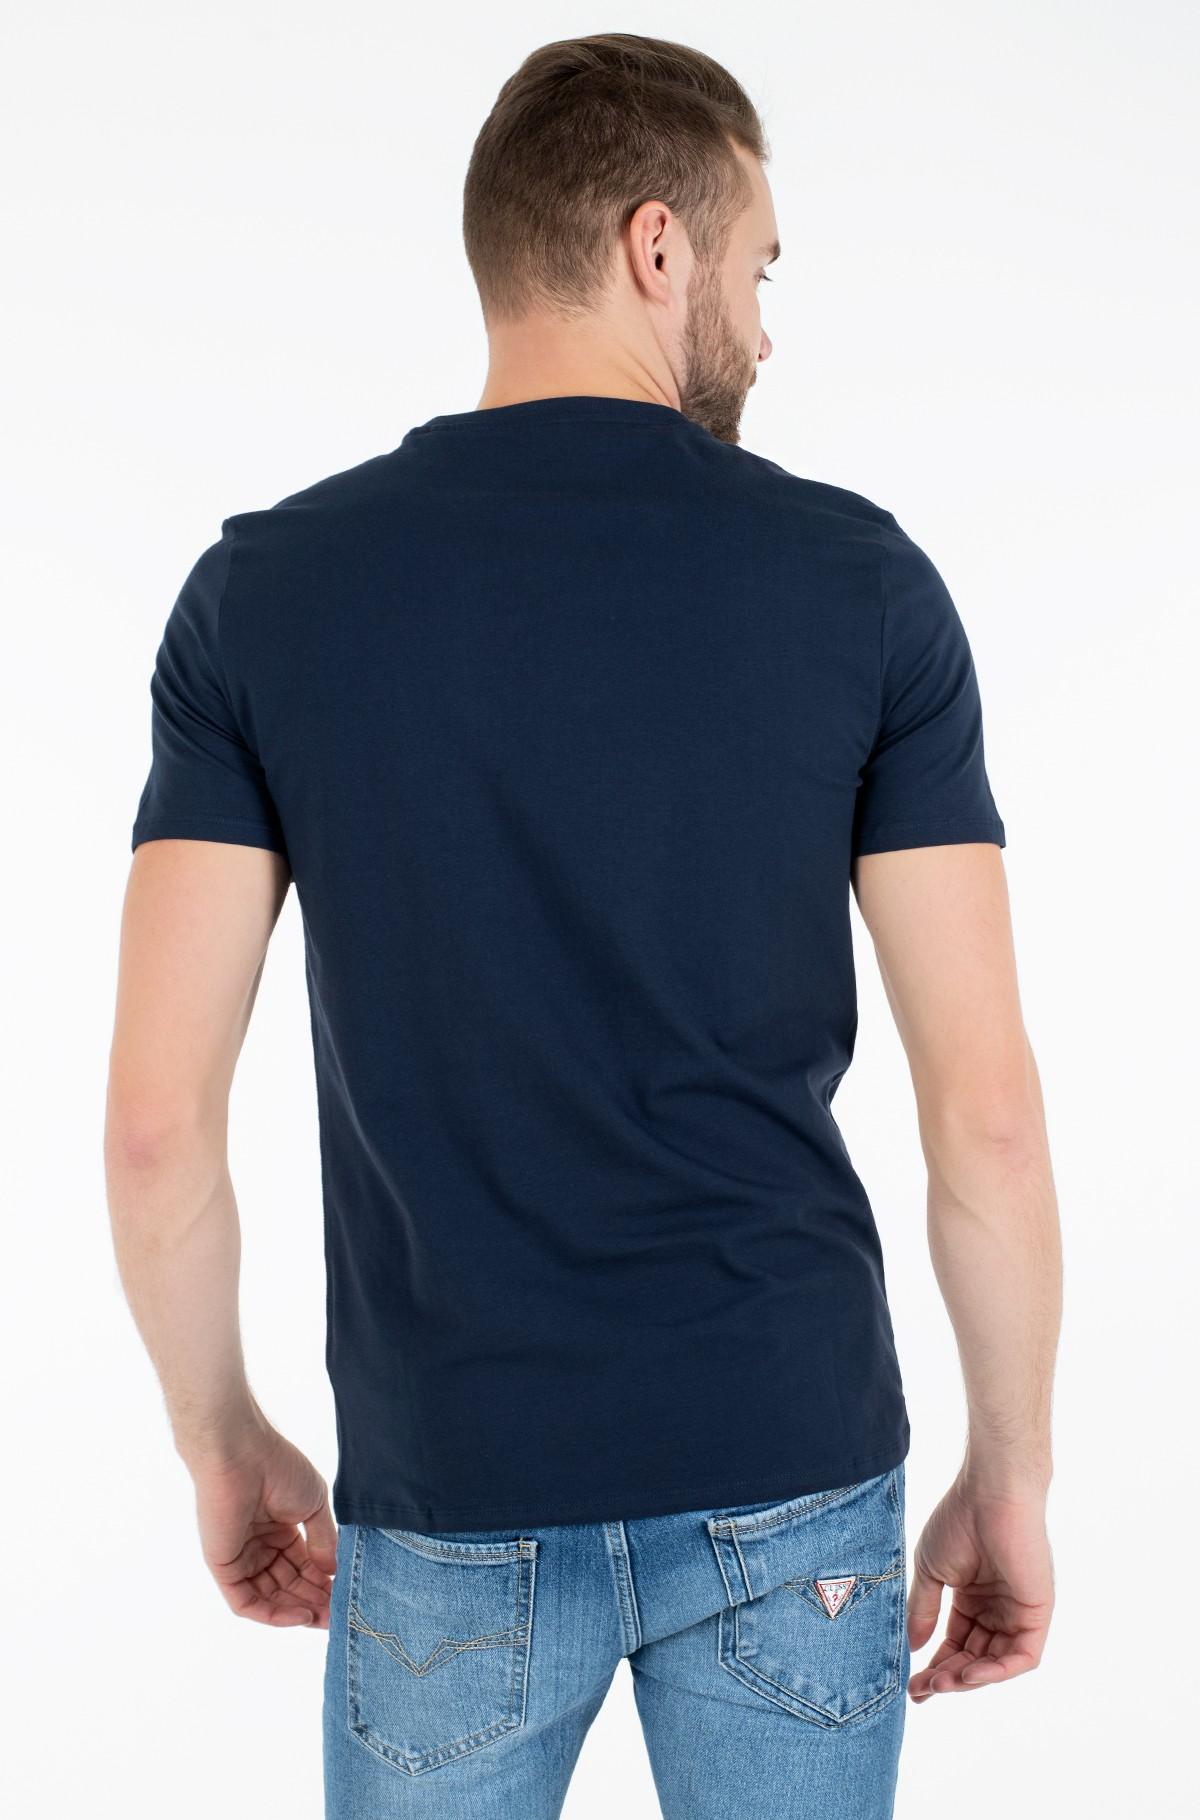 T-shirt M0BI58 J1300-full-2